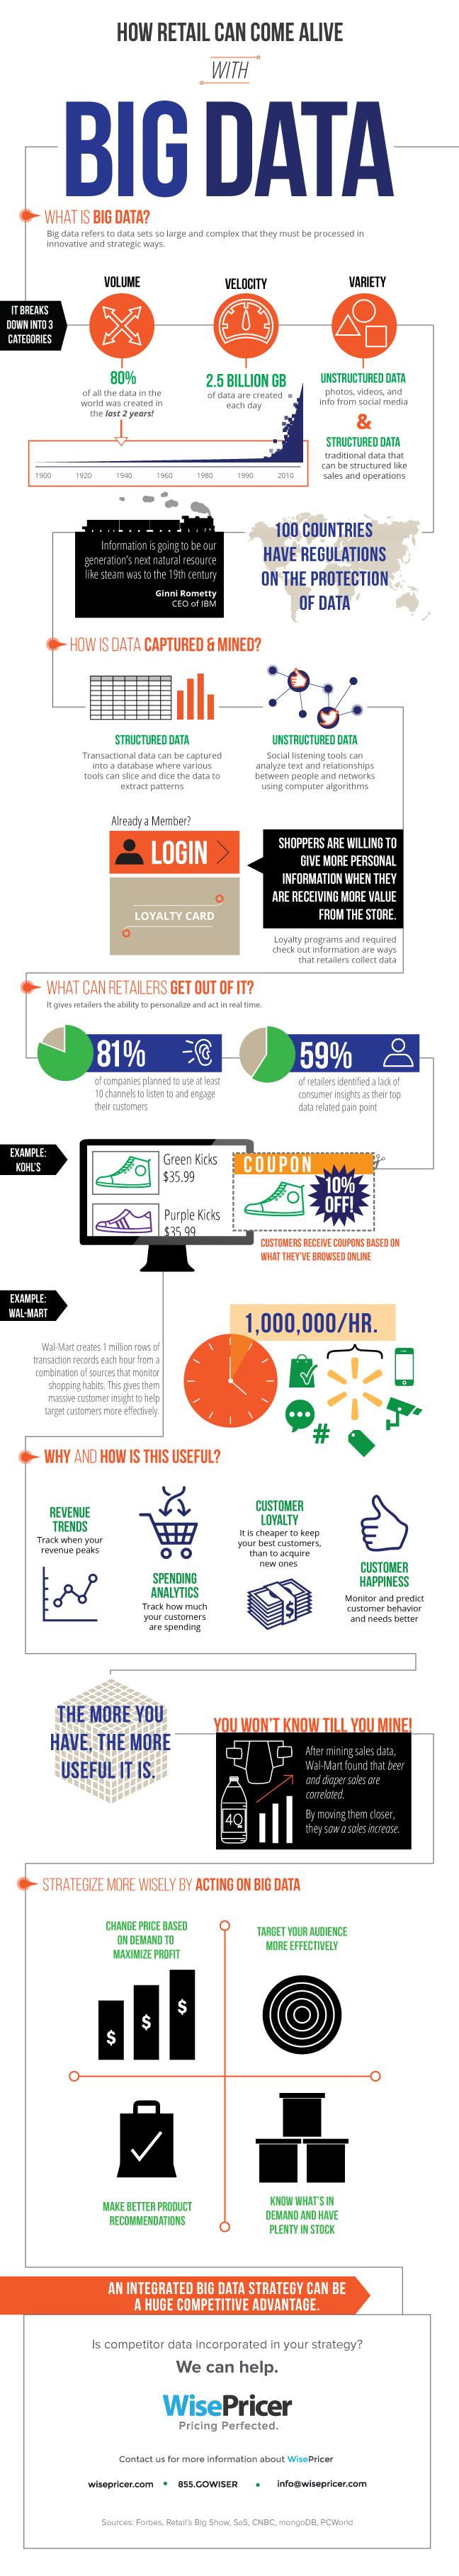 infographic-bigdata-retail-2014